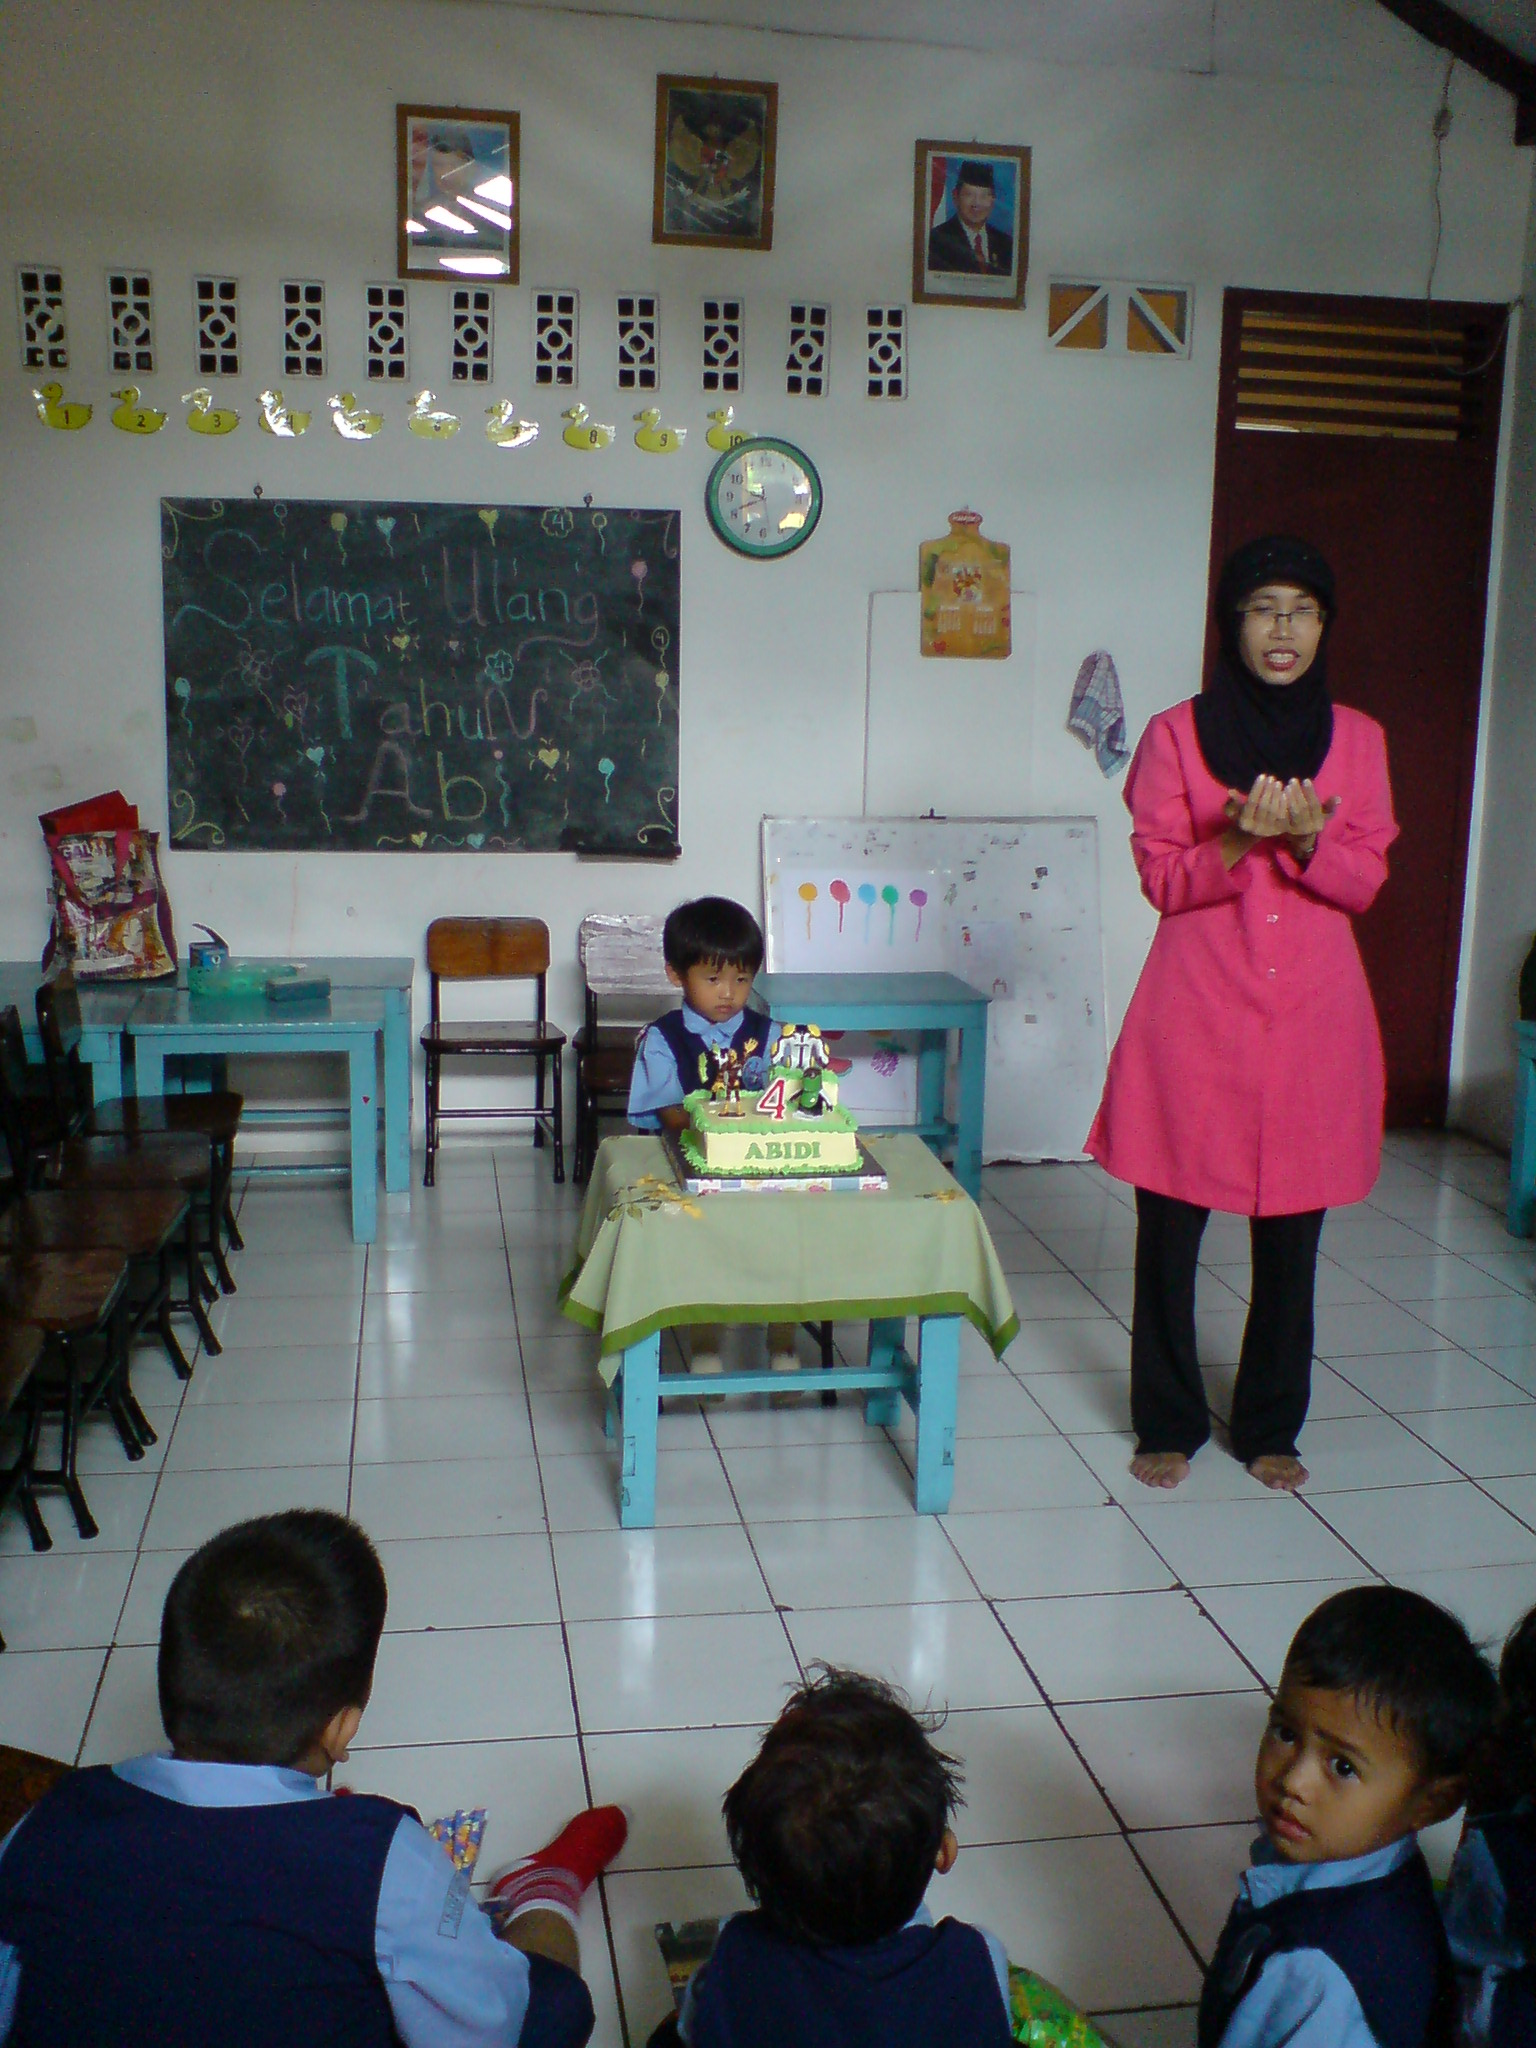 Kue Ultah Anak Cowok Search Results Calendar 2015